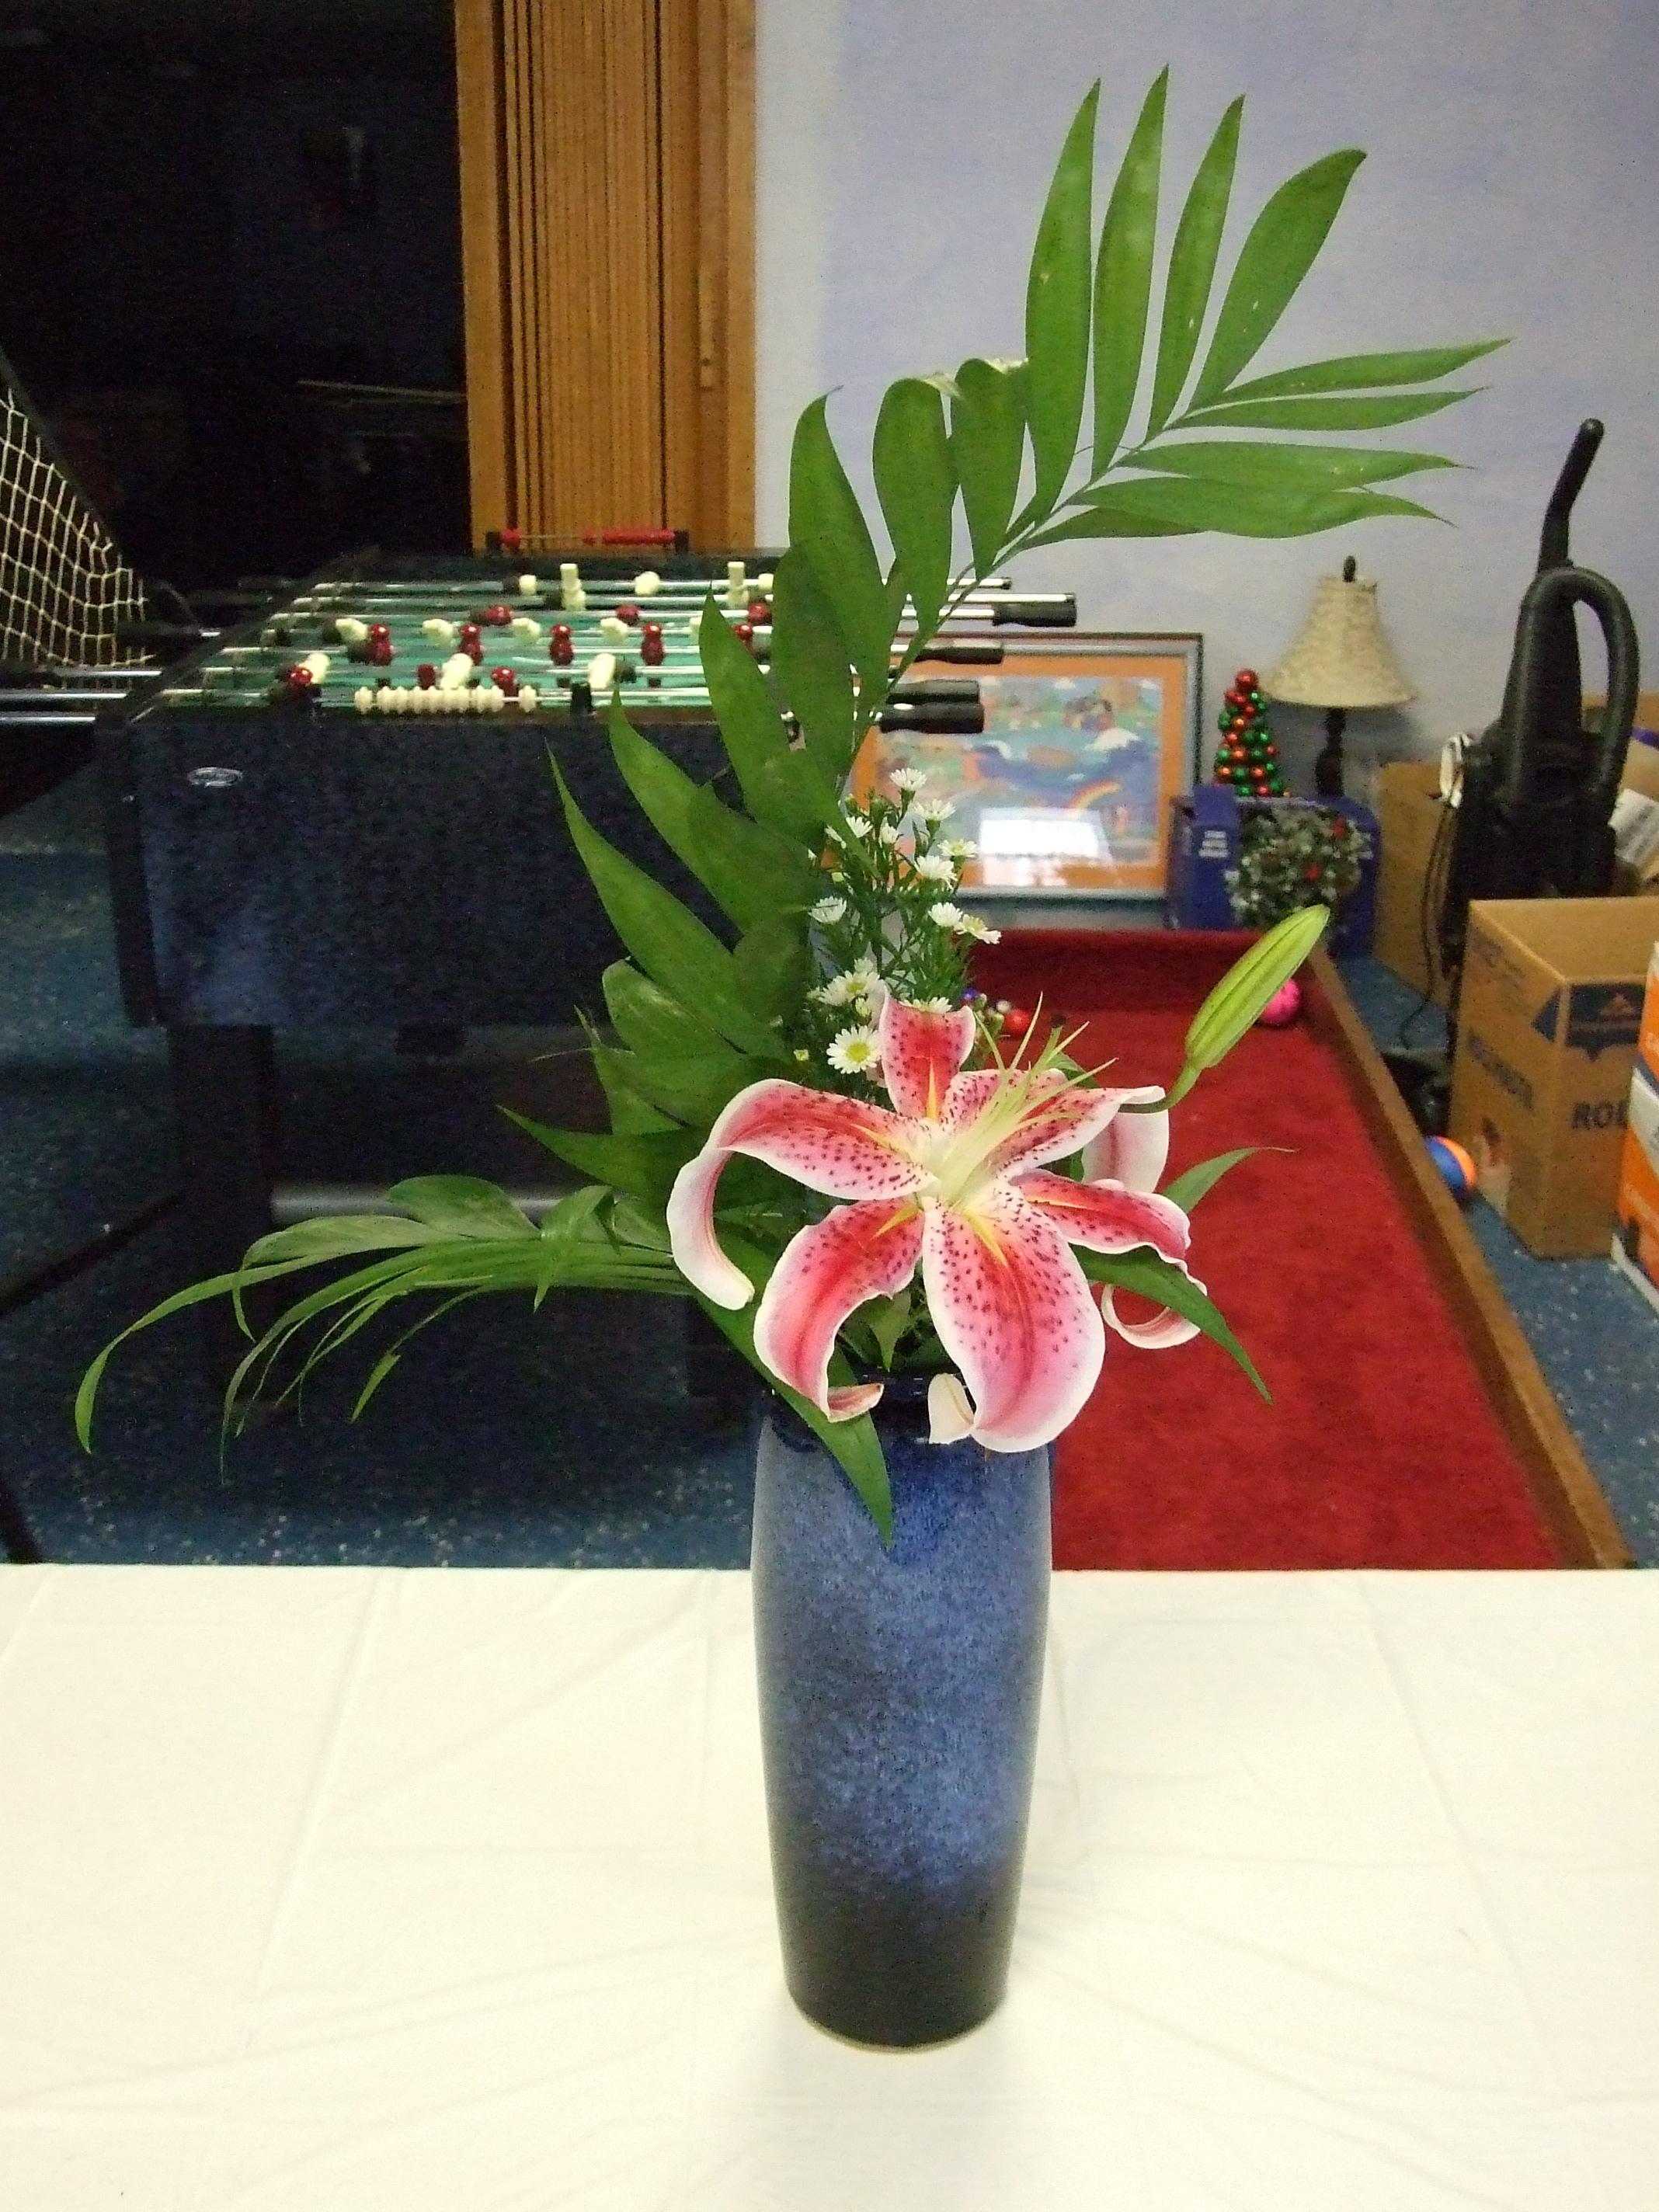 Palm, Star gazer lilly, white aster.